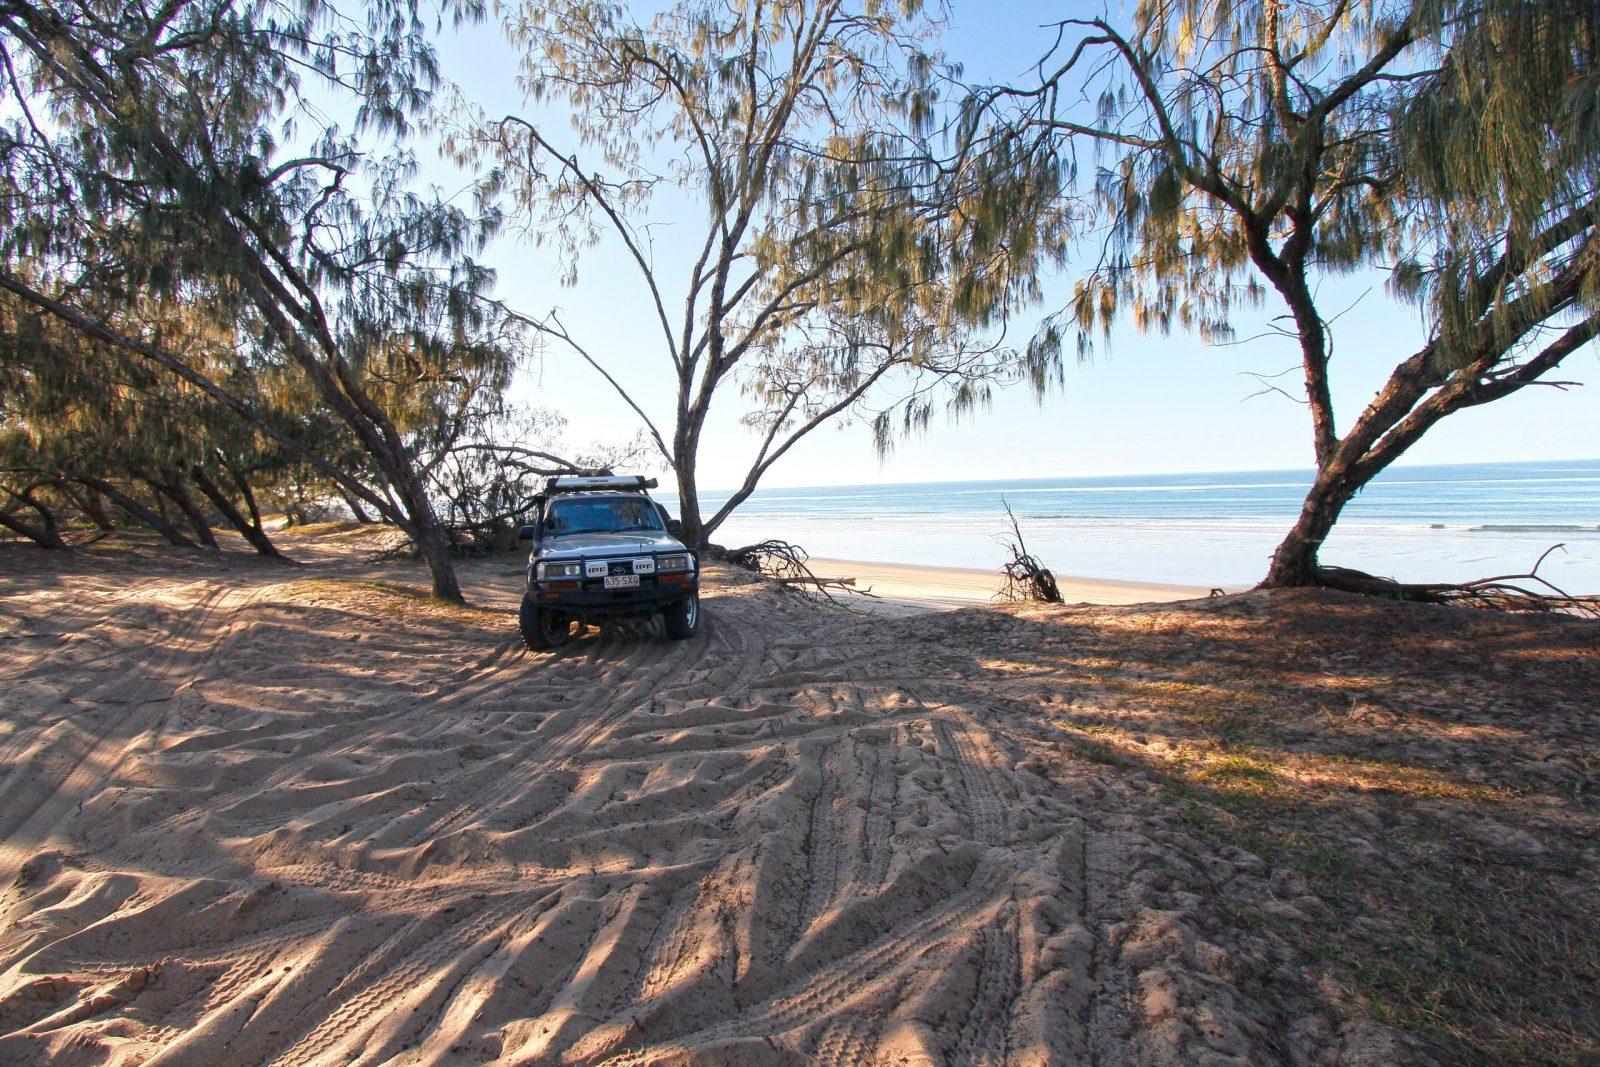 Car parked under shade of coastal trees at back of sandy beach.